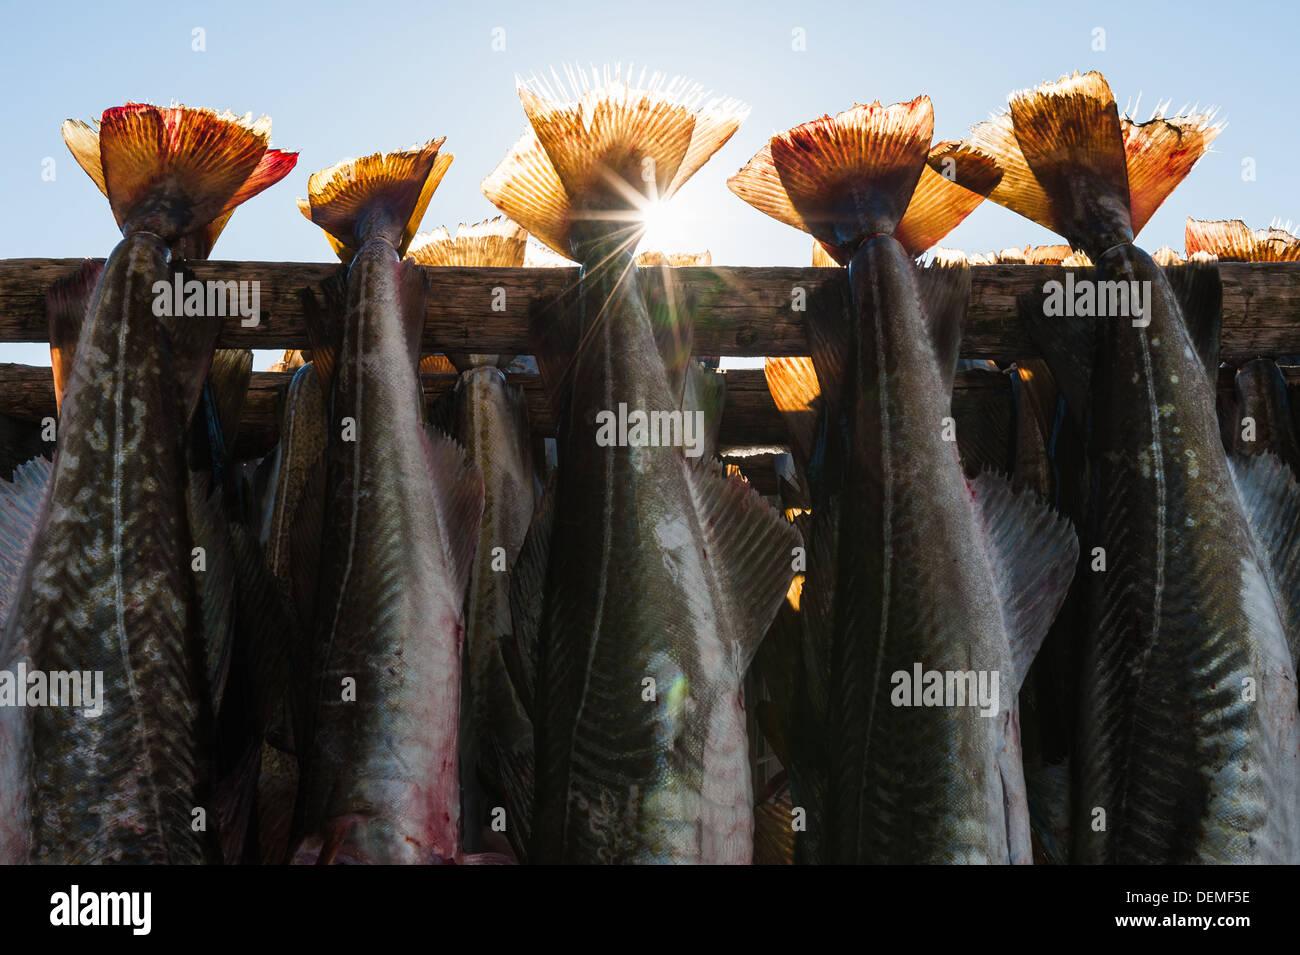 Sun shining through fish hanging up to dry, Norway. - Stock Image